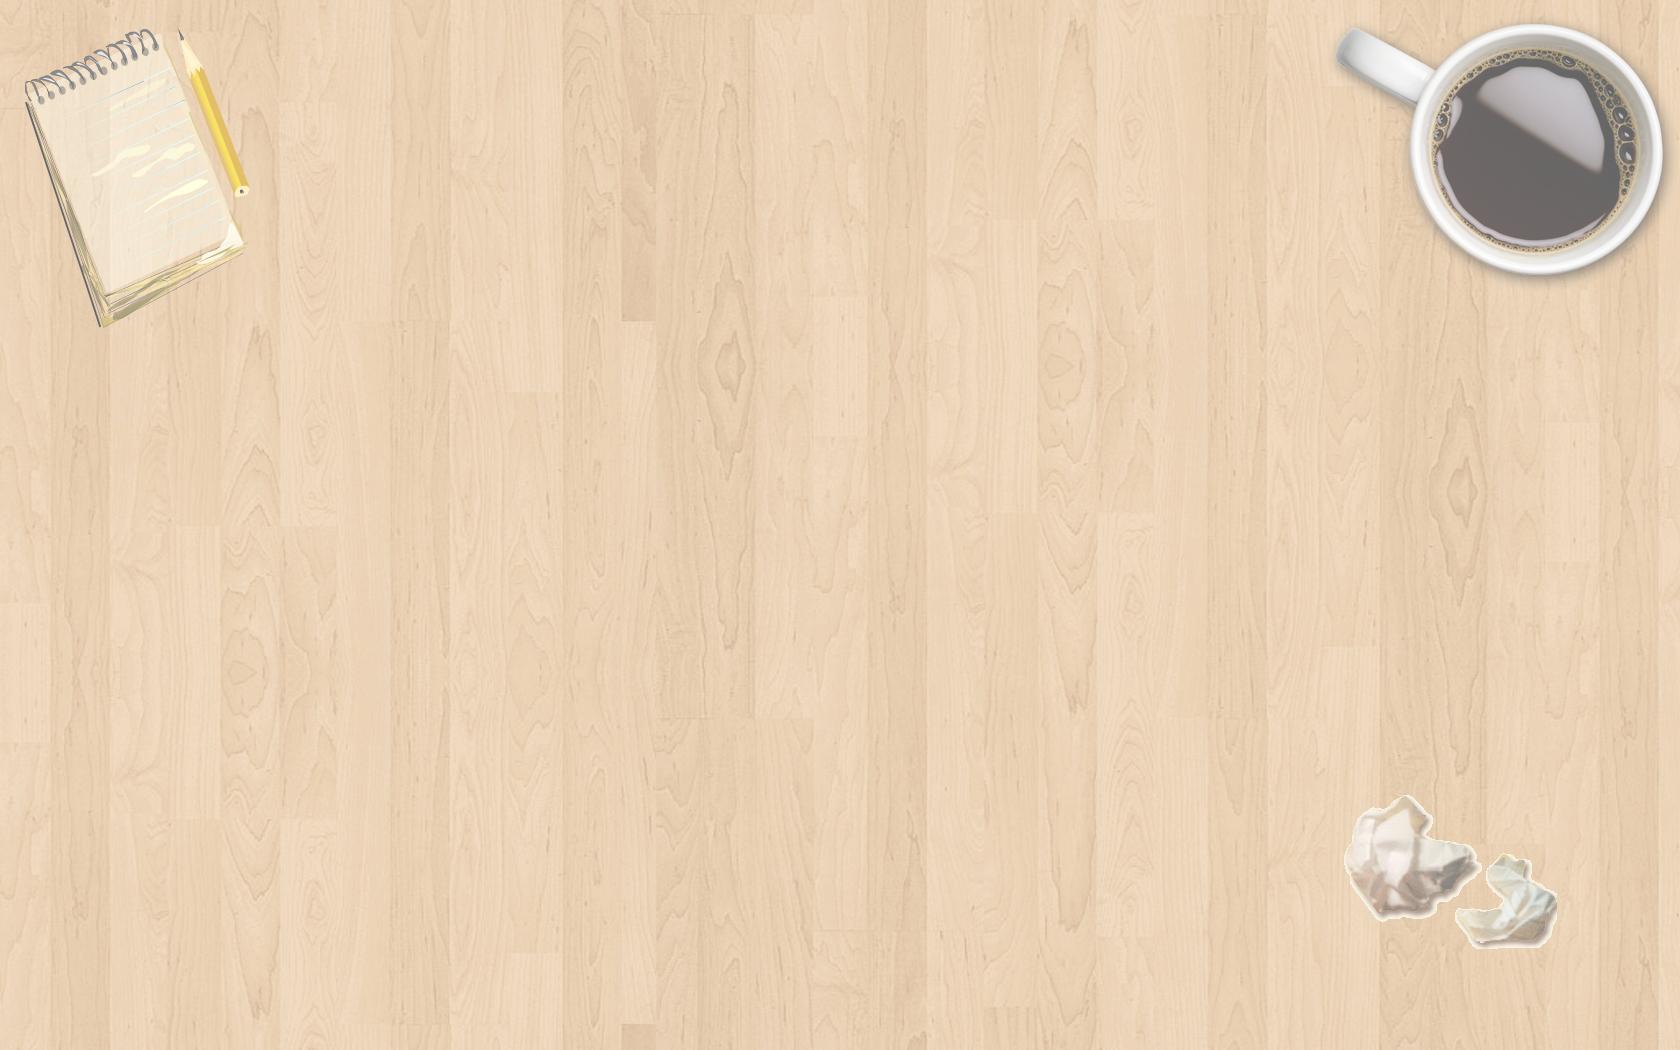 office style desktop background Wallpaper Downloads